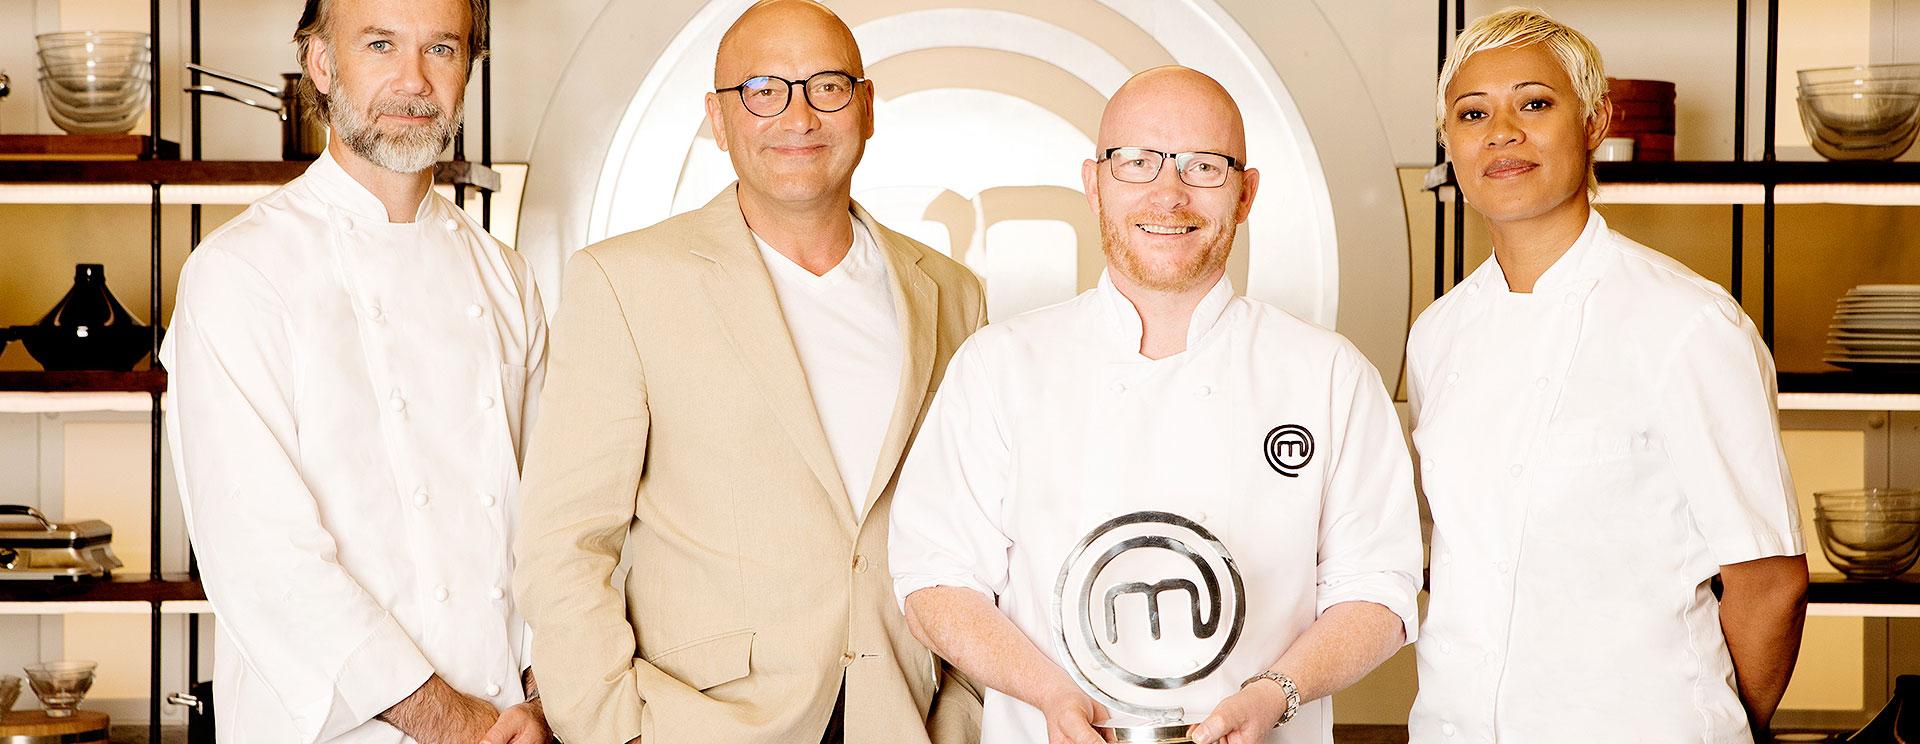 Gary Maclean - Award winning Chef and Winner of MasterChef The Professionals